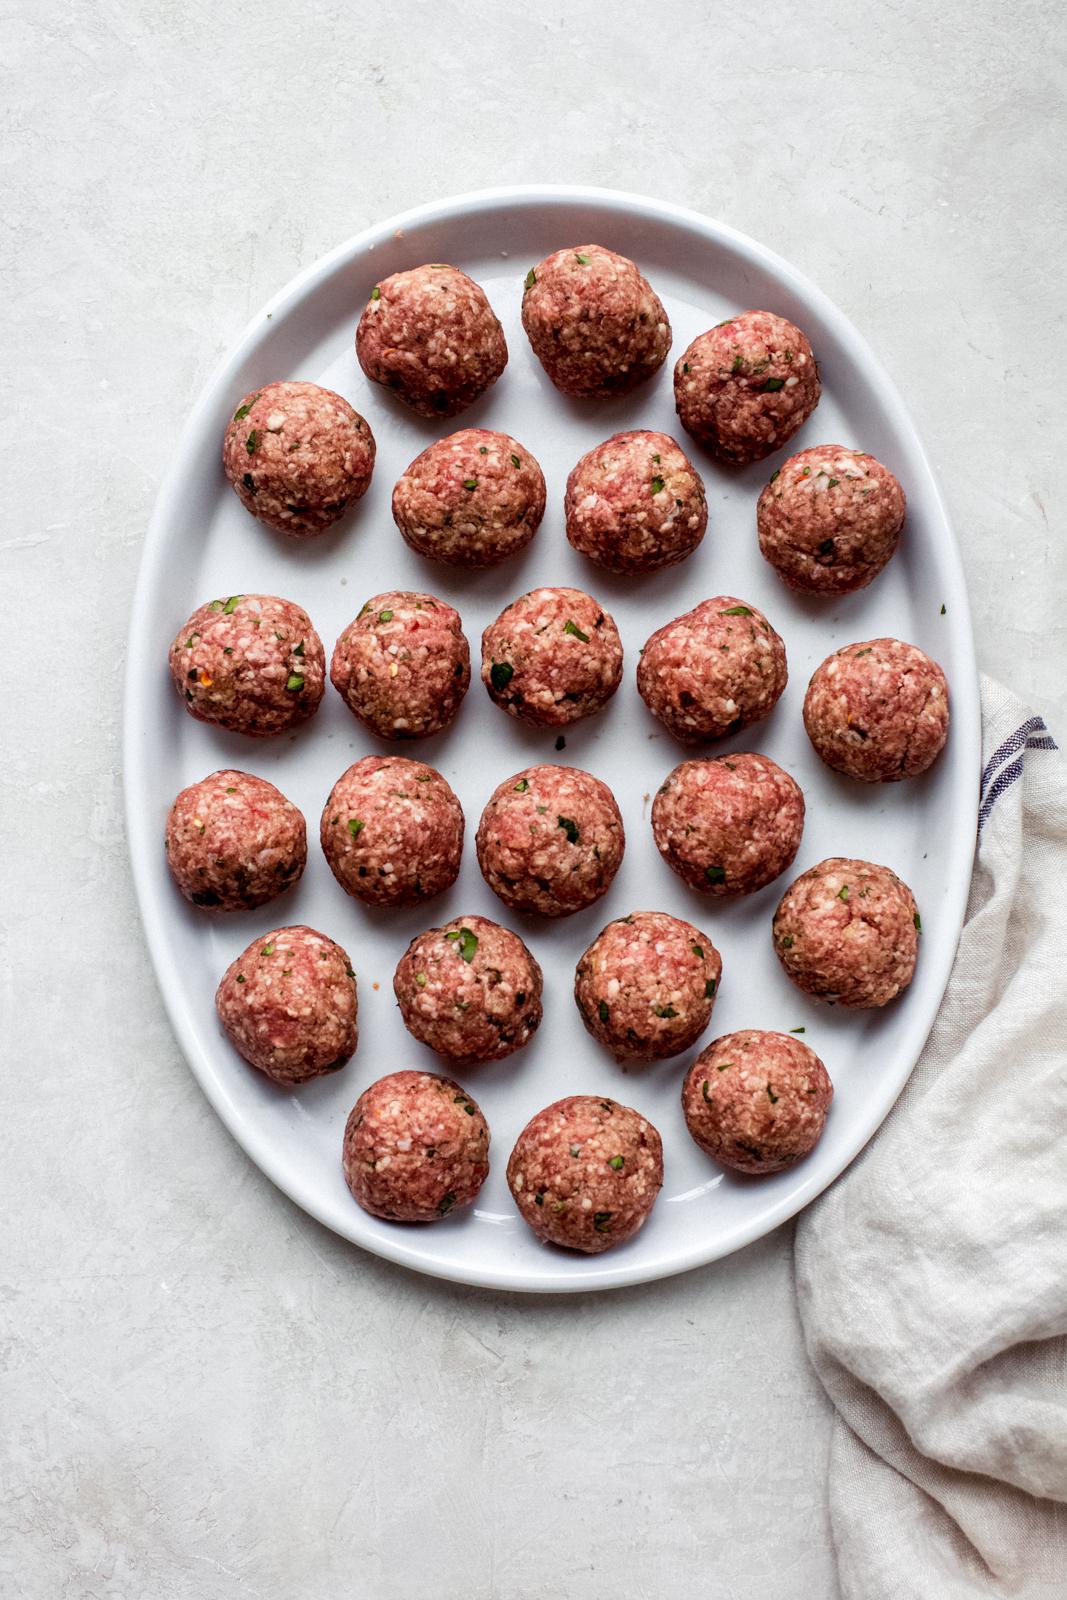 prepared meatballs on white plate